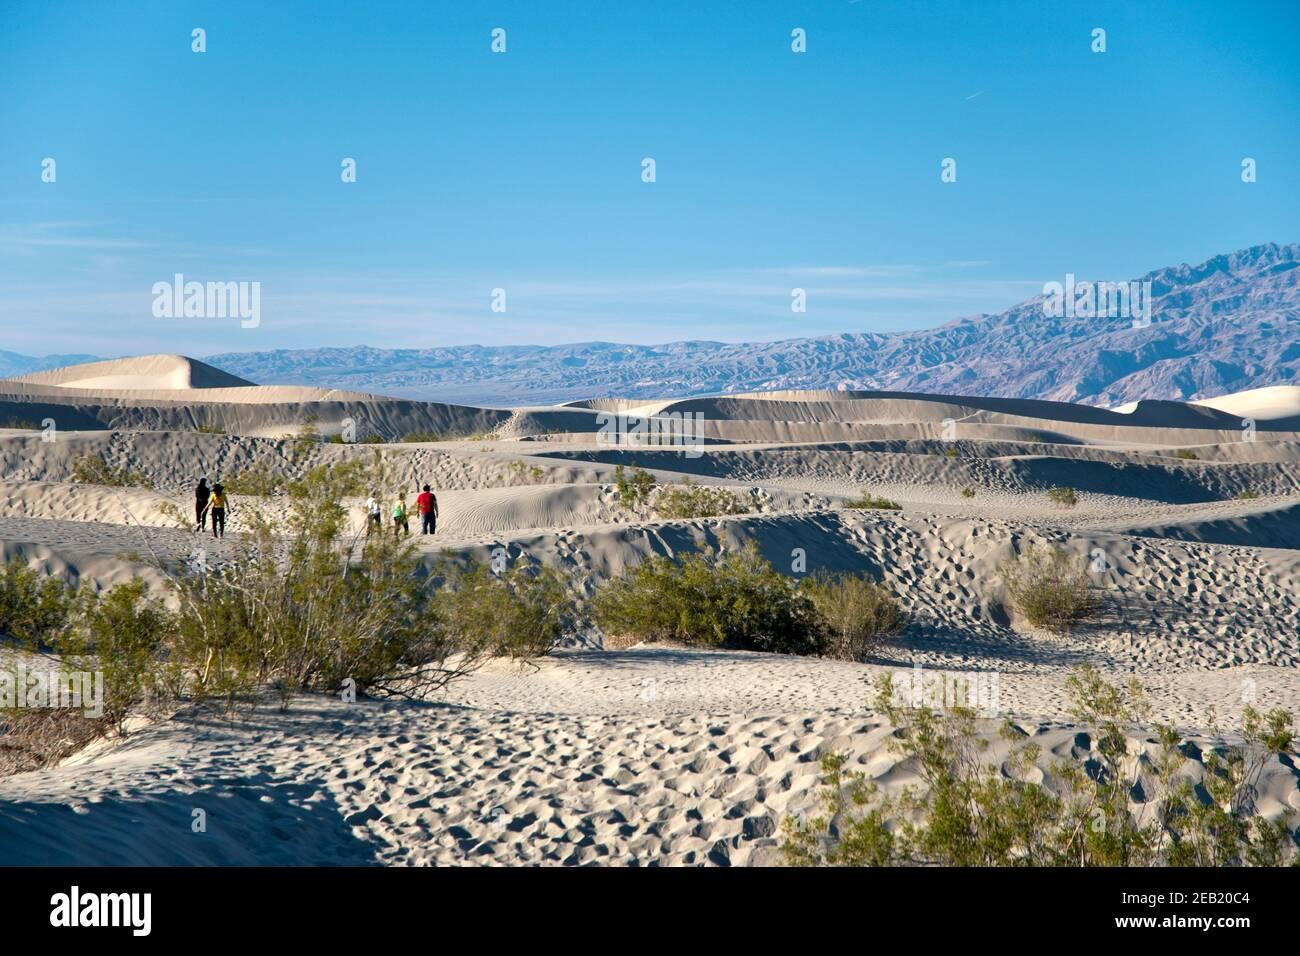 Le dune di sabbia di Mesquite Flats all'estremità nord del Death Valley National Park, California. Foto Stock